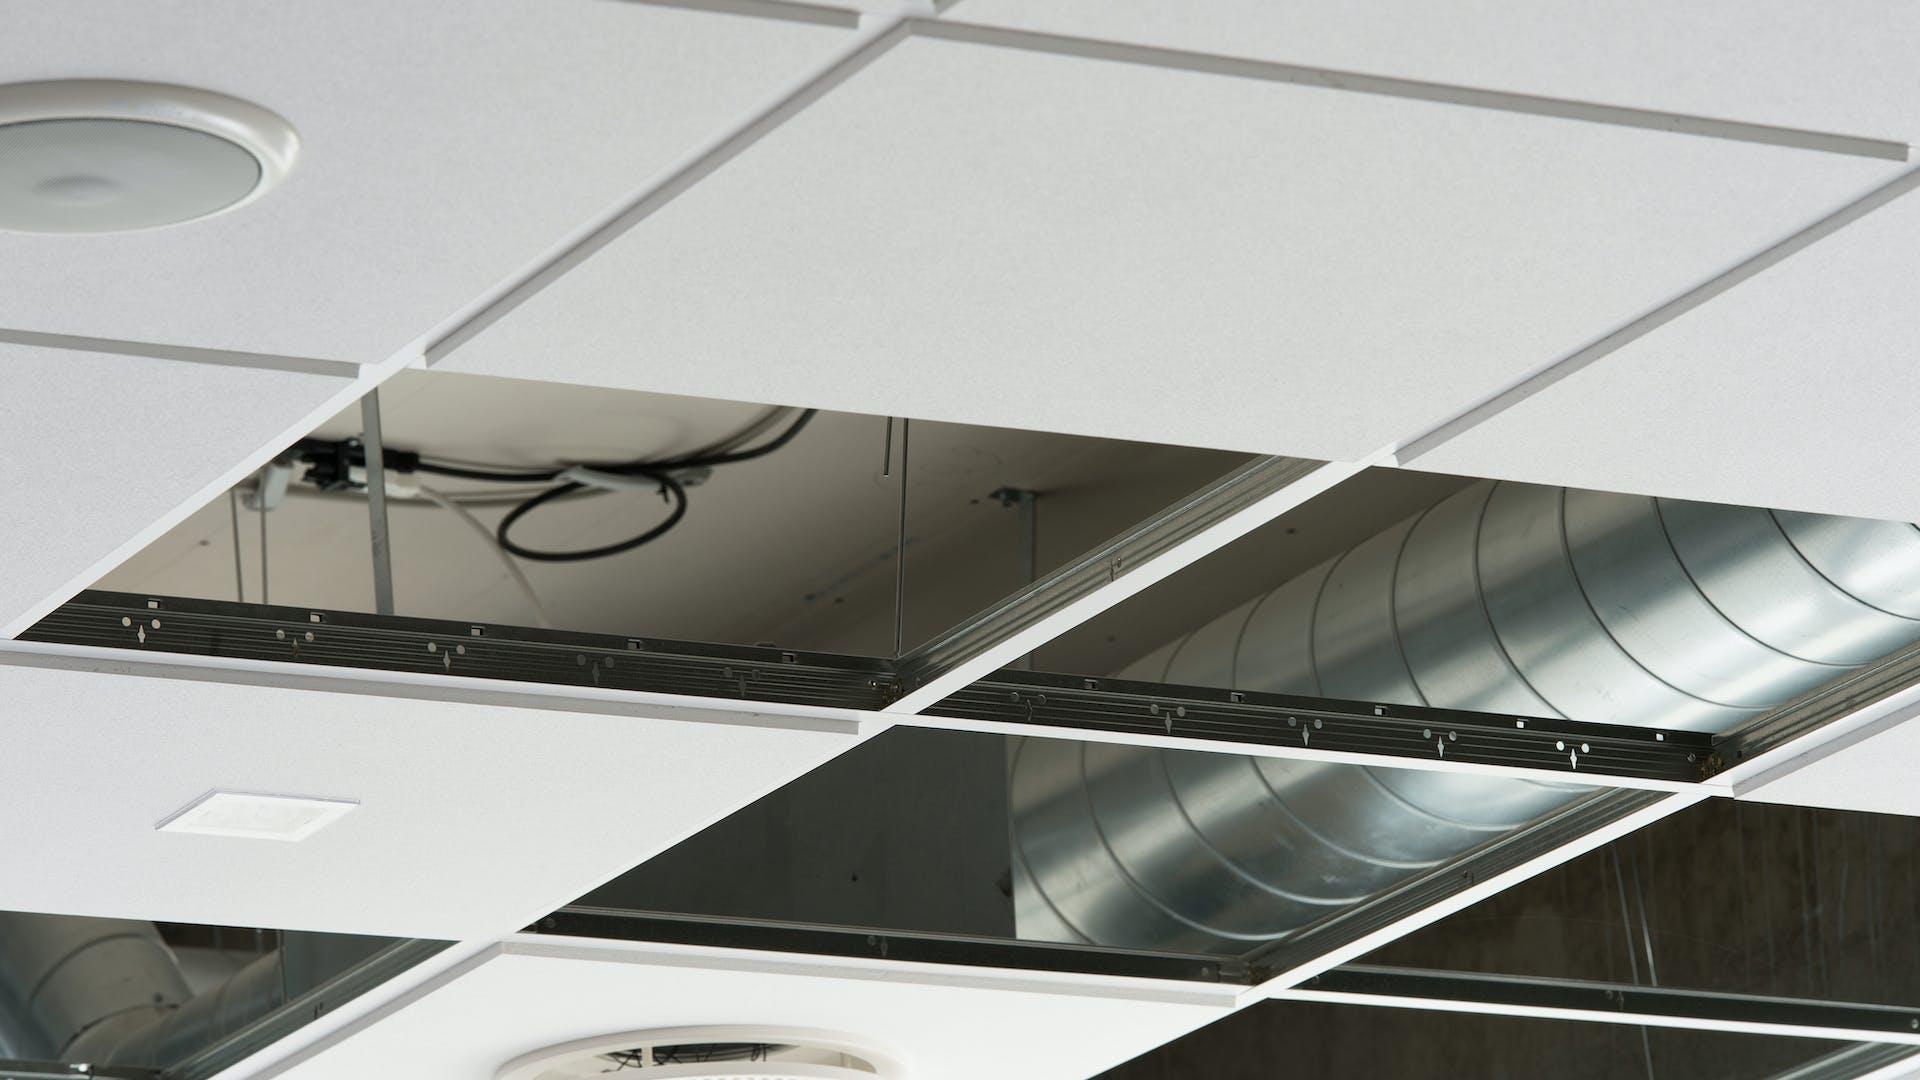 Sydmors Skole school education Sonar E-edge X-edge 600x600 ventilation Rockfon 2013